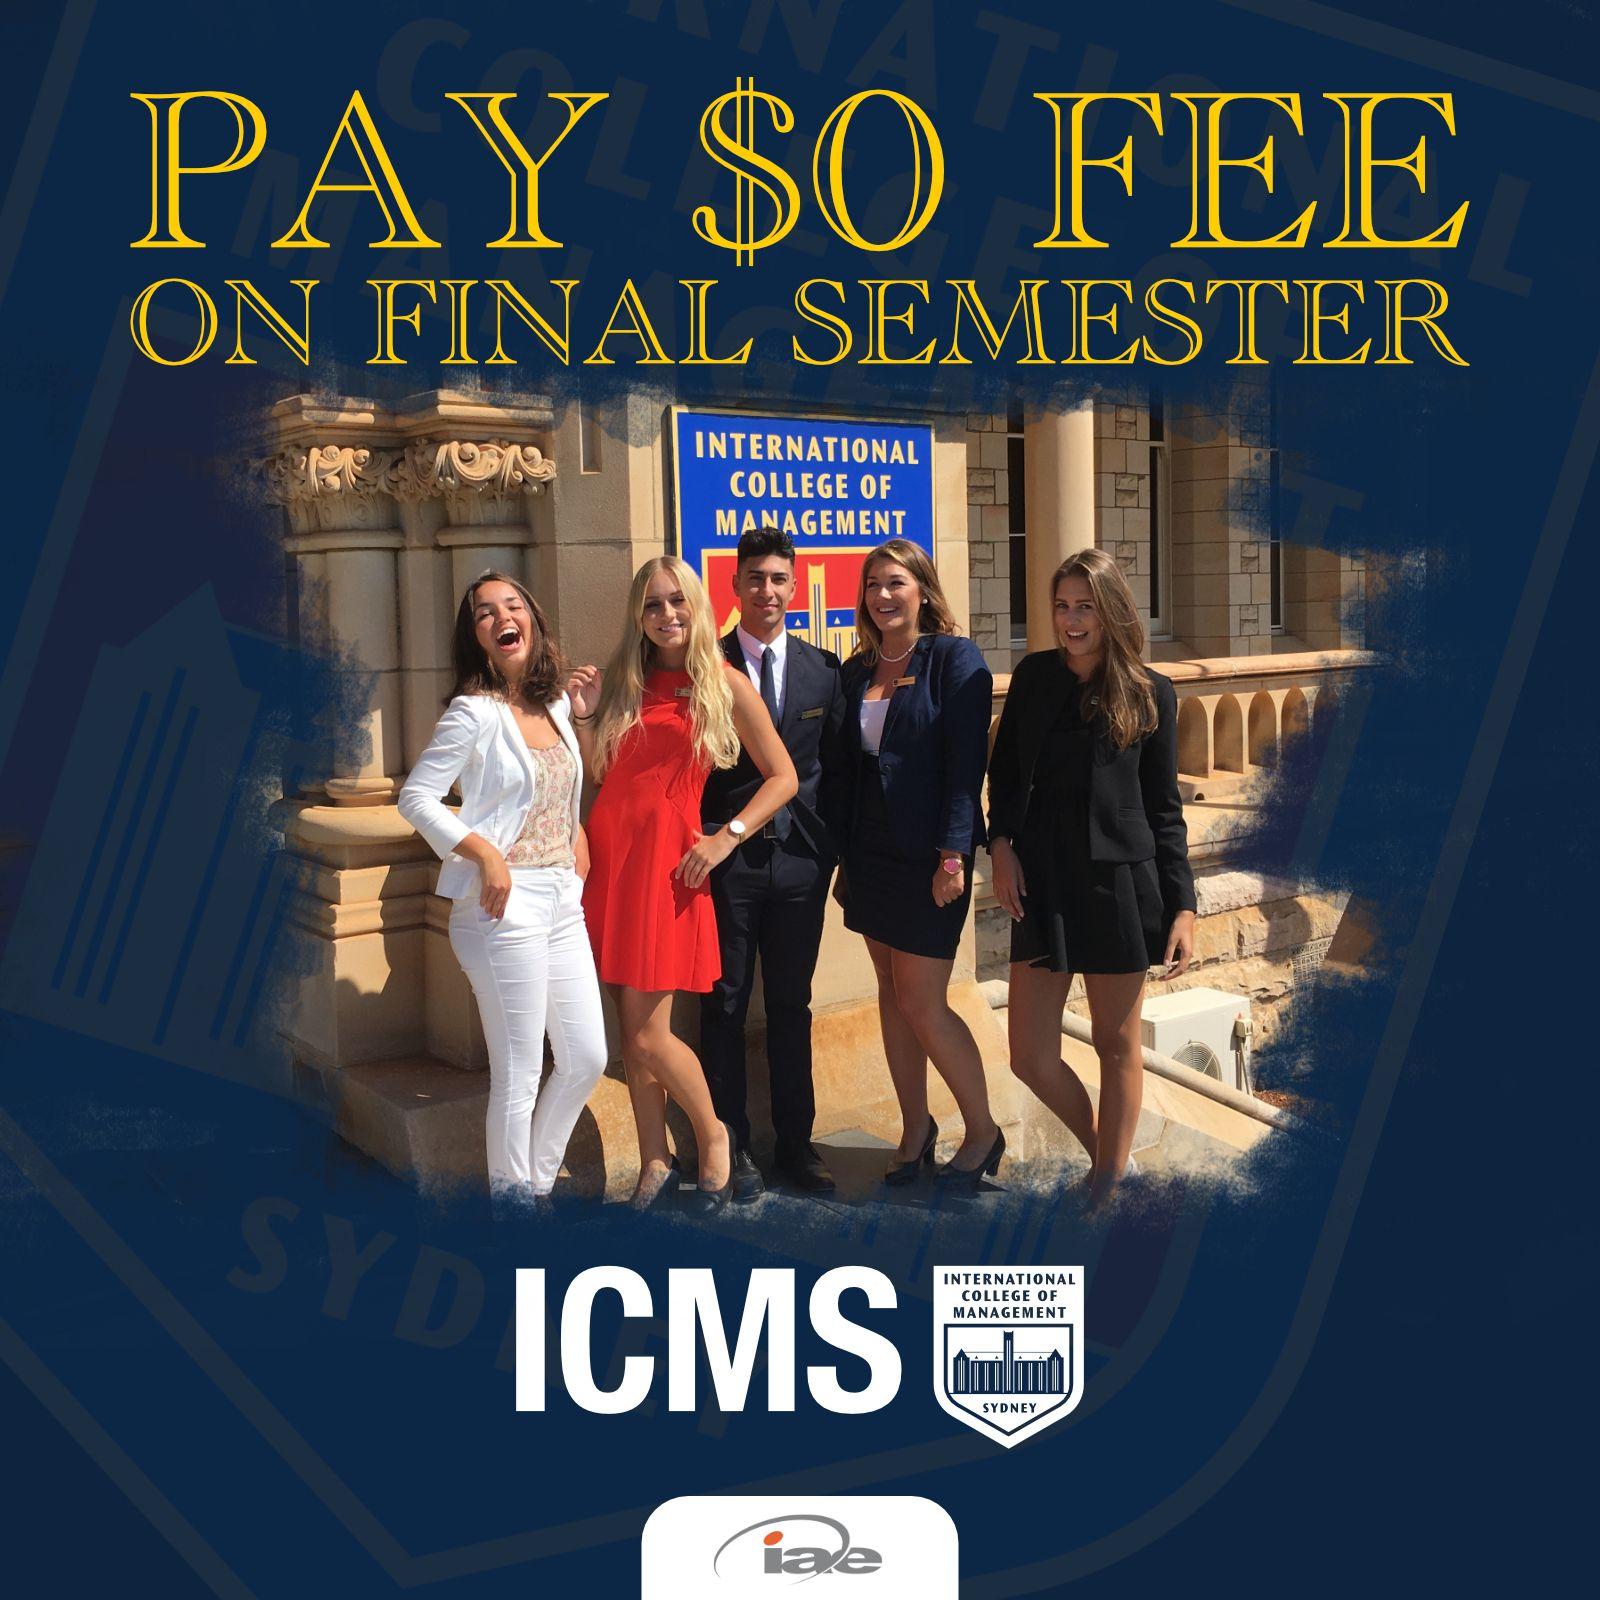 ICMS_no_fee_on_last_semester